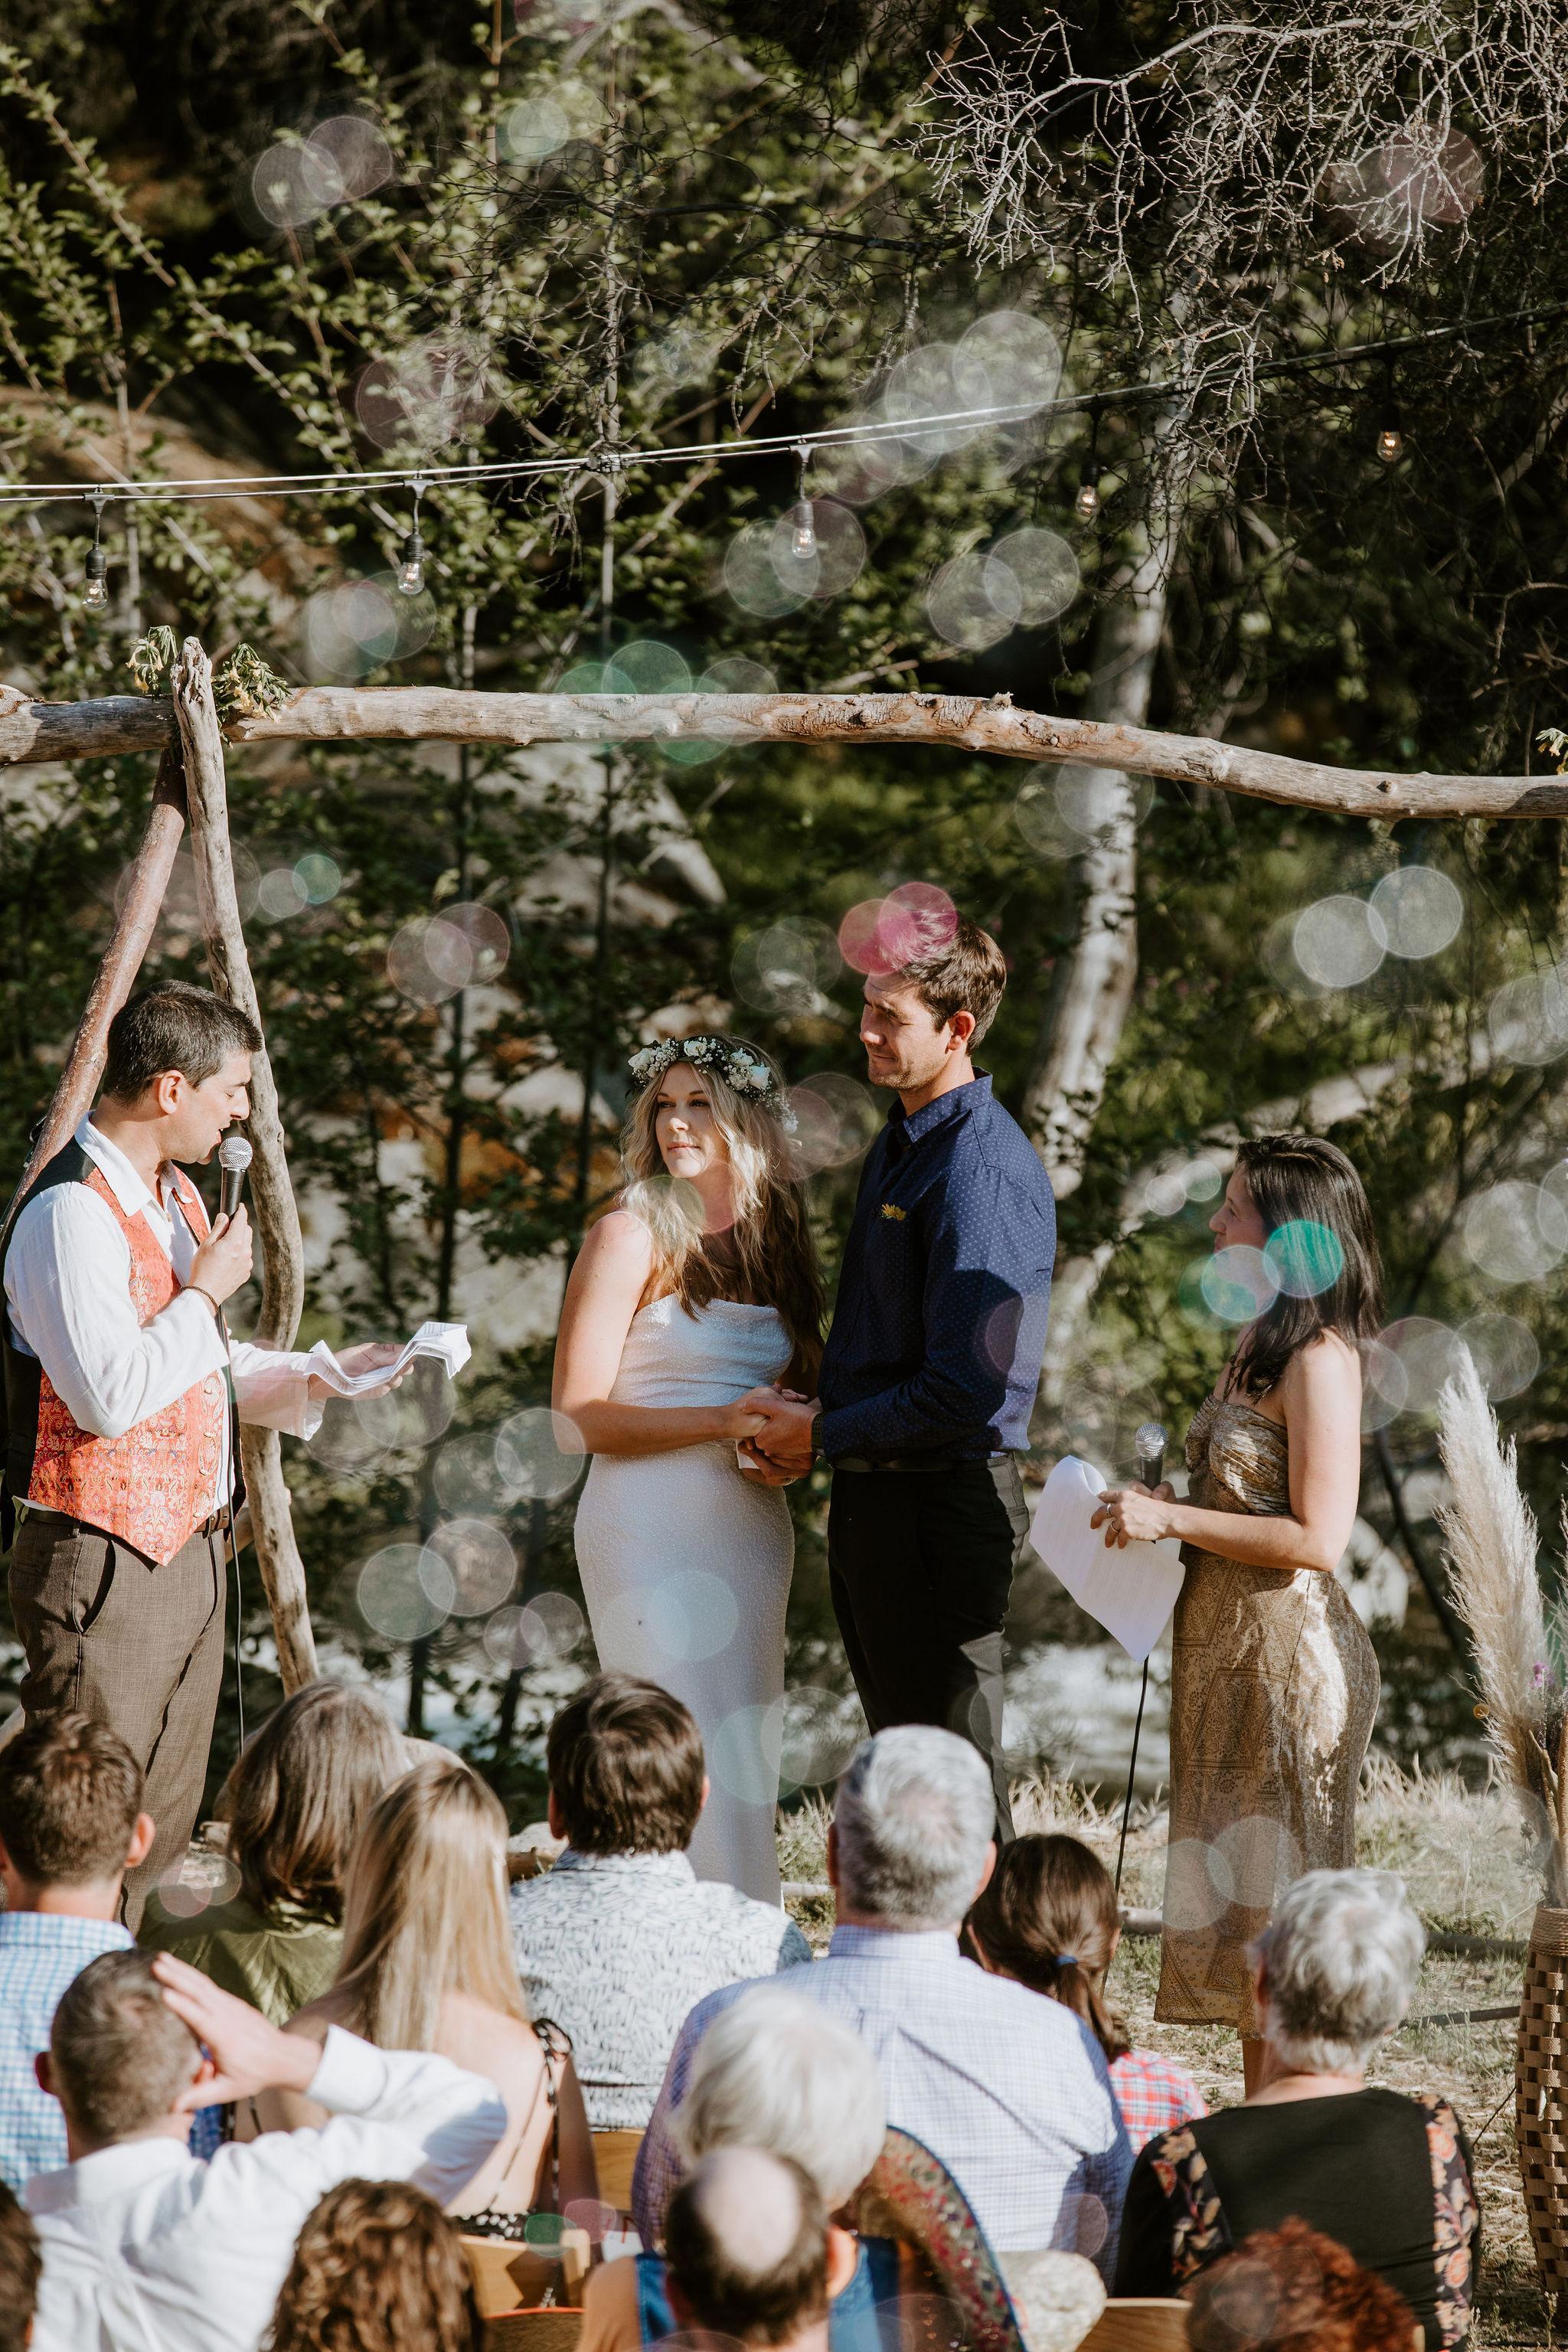 RedwoodRanch_Geoff&LyndsiPhotography_Mike&Amanda_Ceremony82.jpg